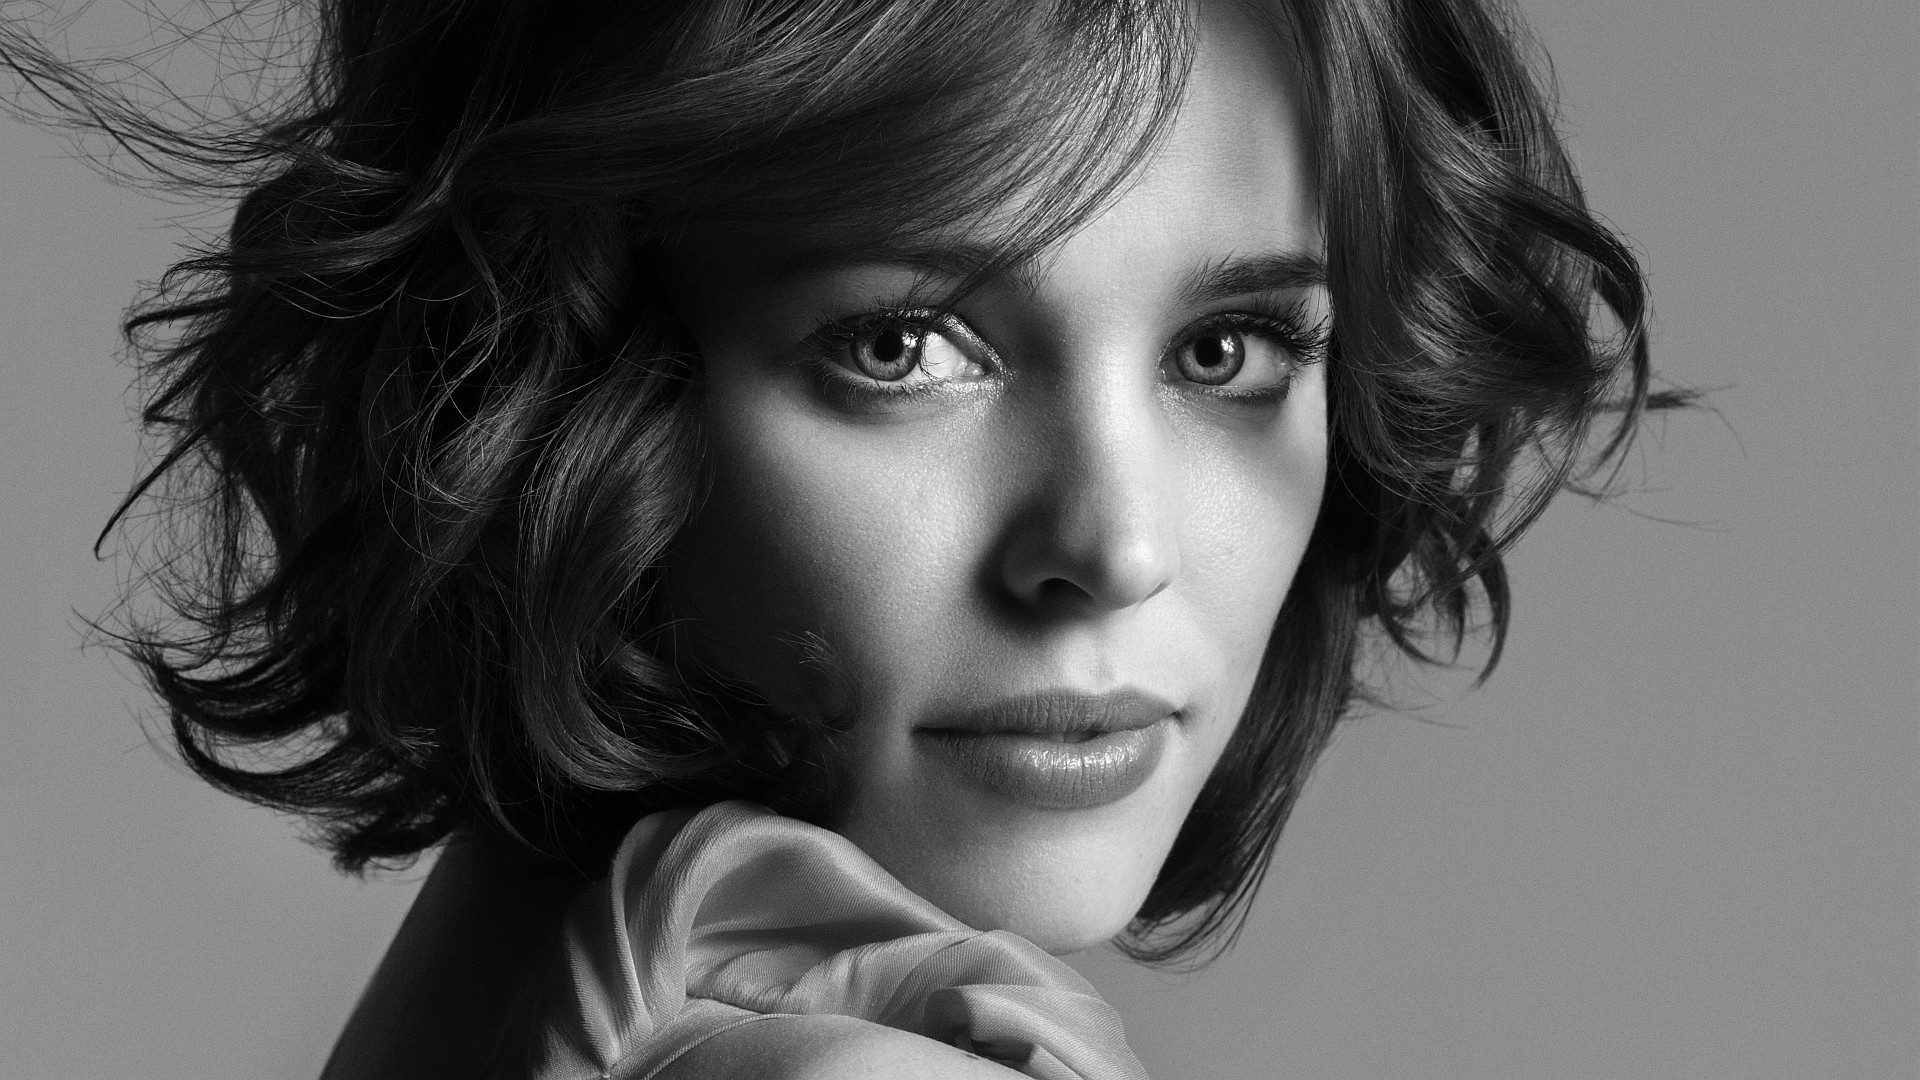 Wallpaper Face Women Model Black Background Looking: Rachel Mcadams, Face, Actress, Full HD Wallpaper